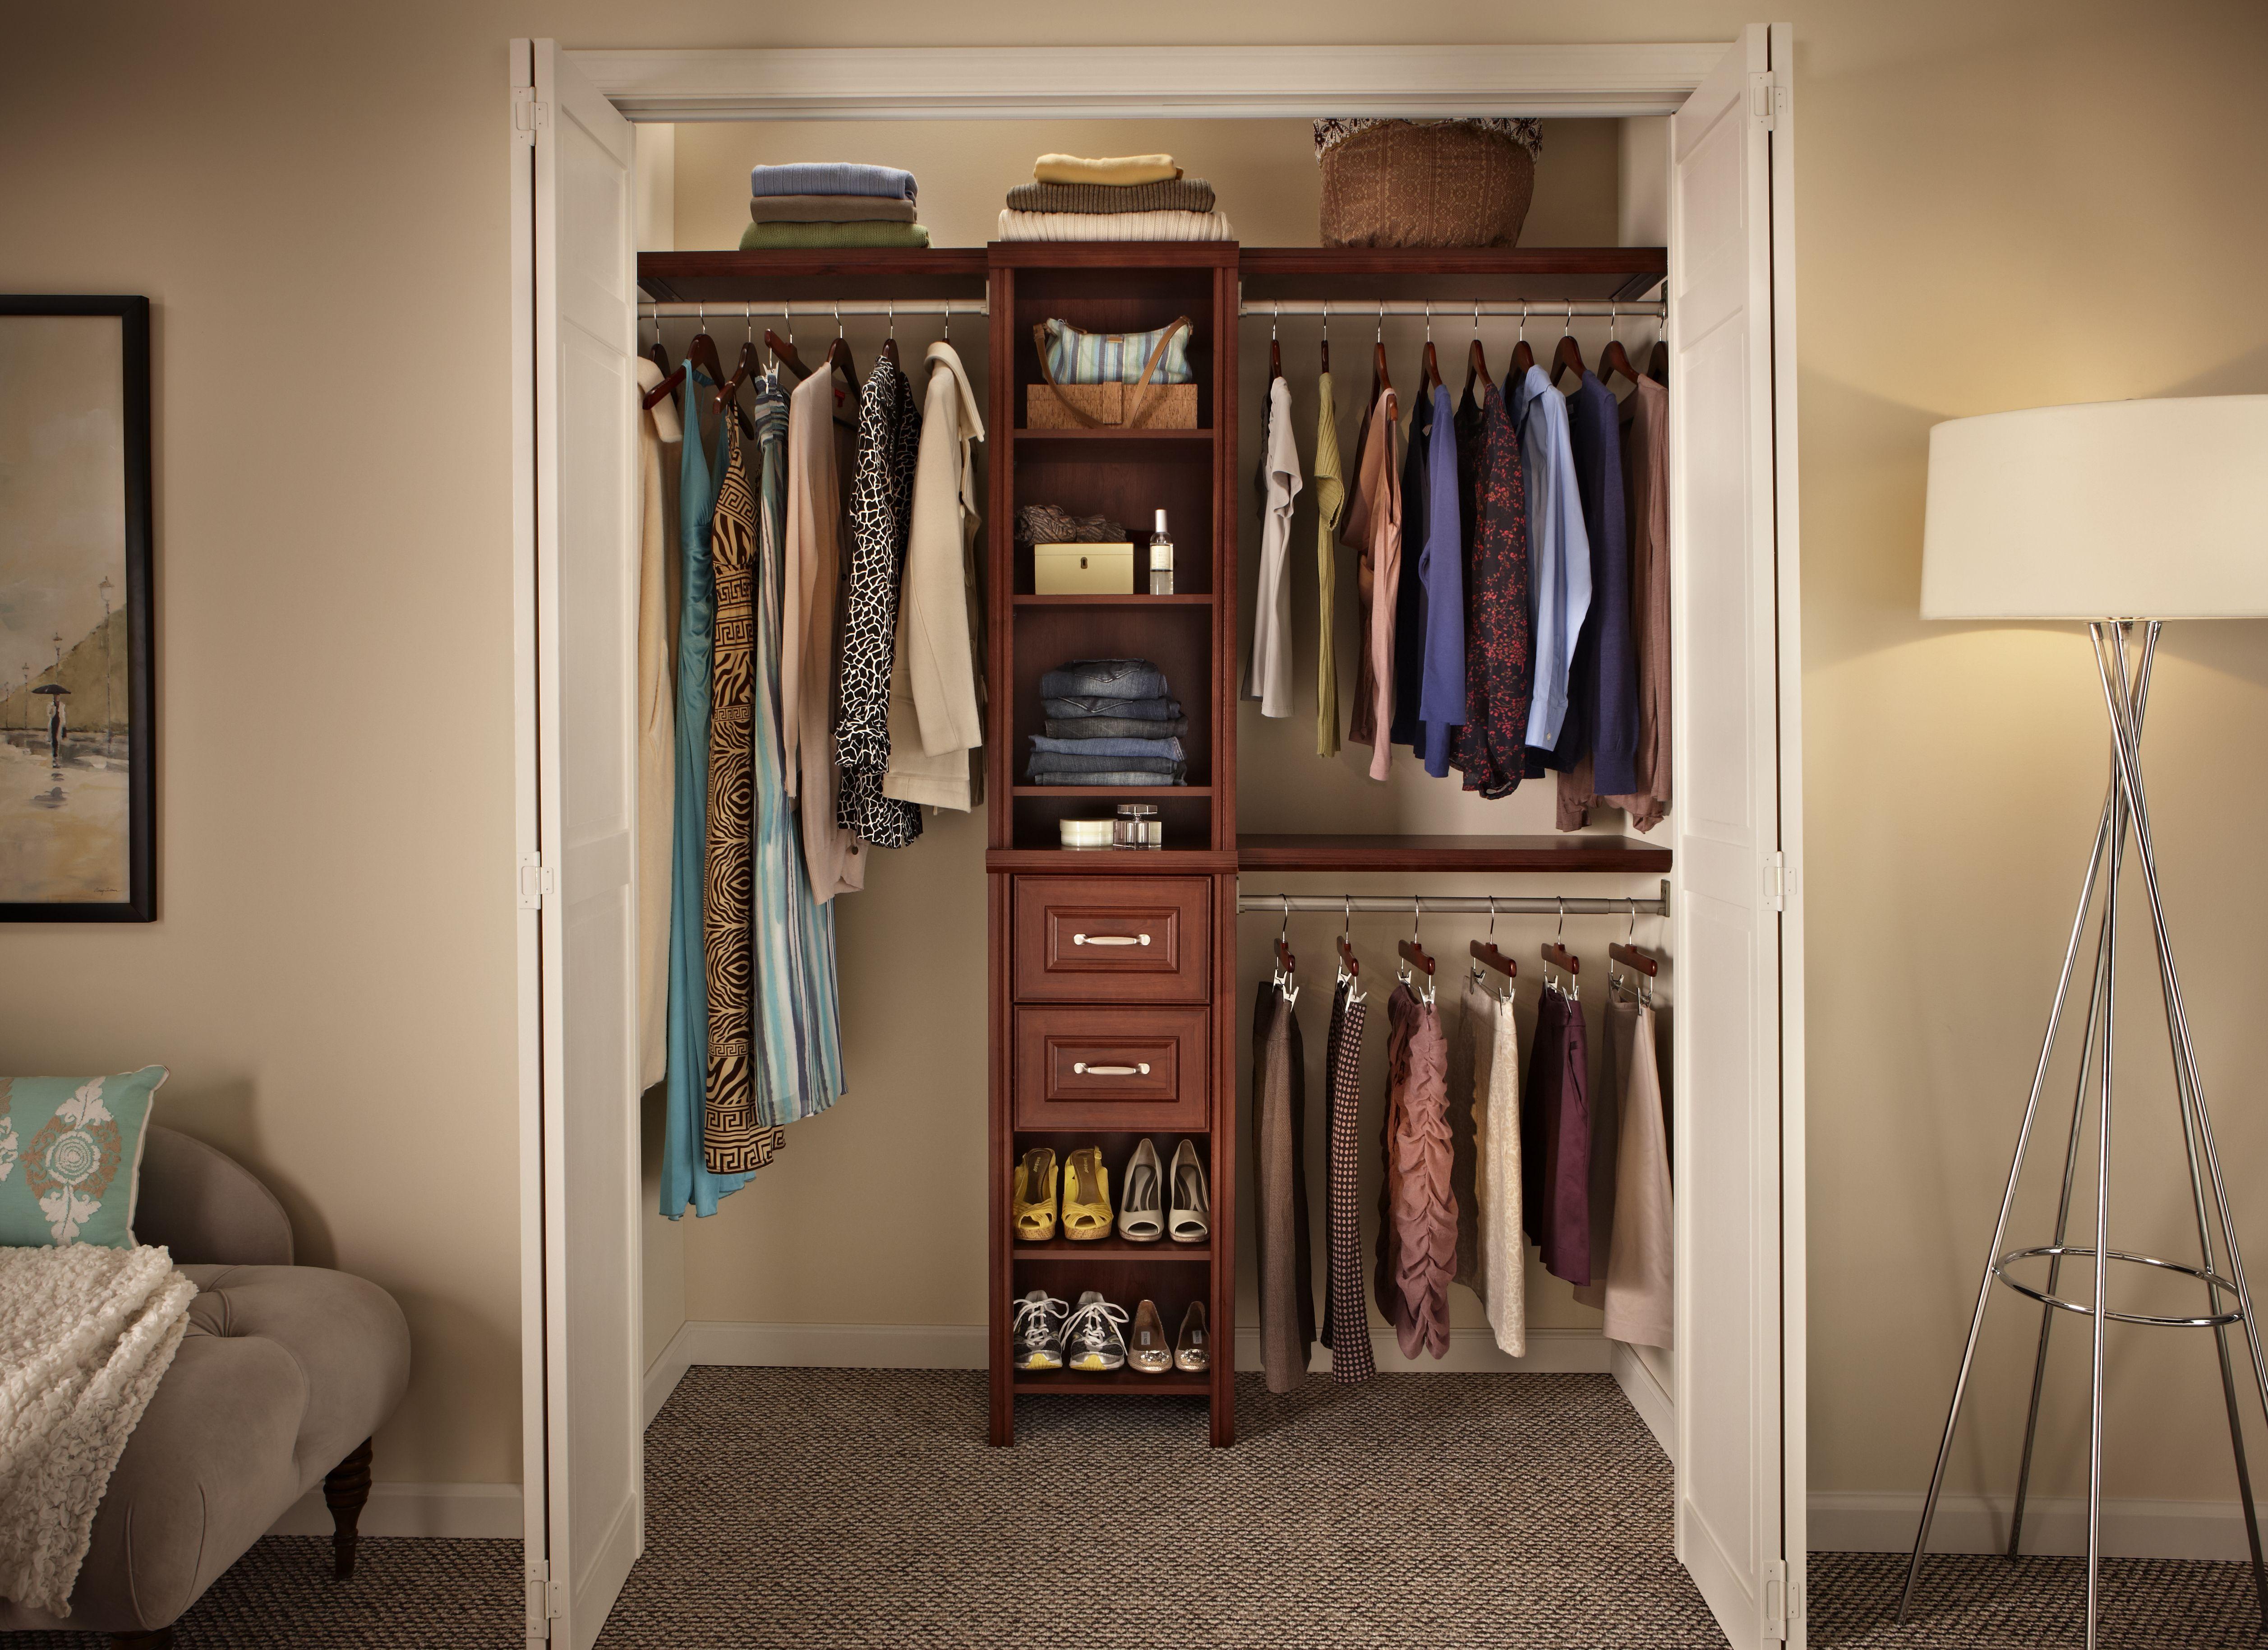 walk closet. Jhmrad.com - Browse Photos Of Walk Closet Organization Ideas With Resolution 5028x3657 Pixel,